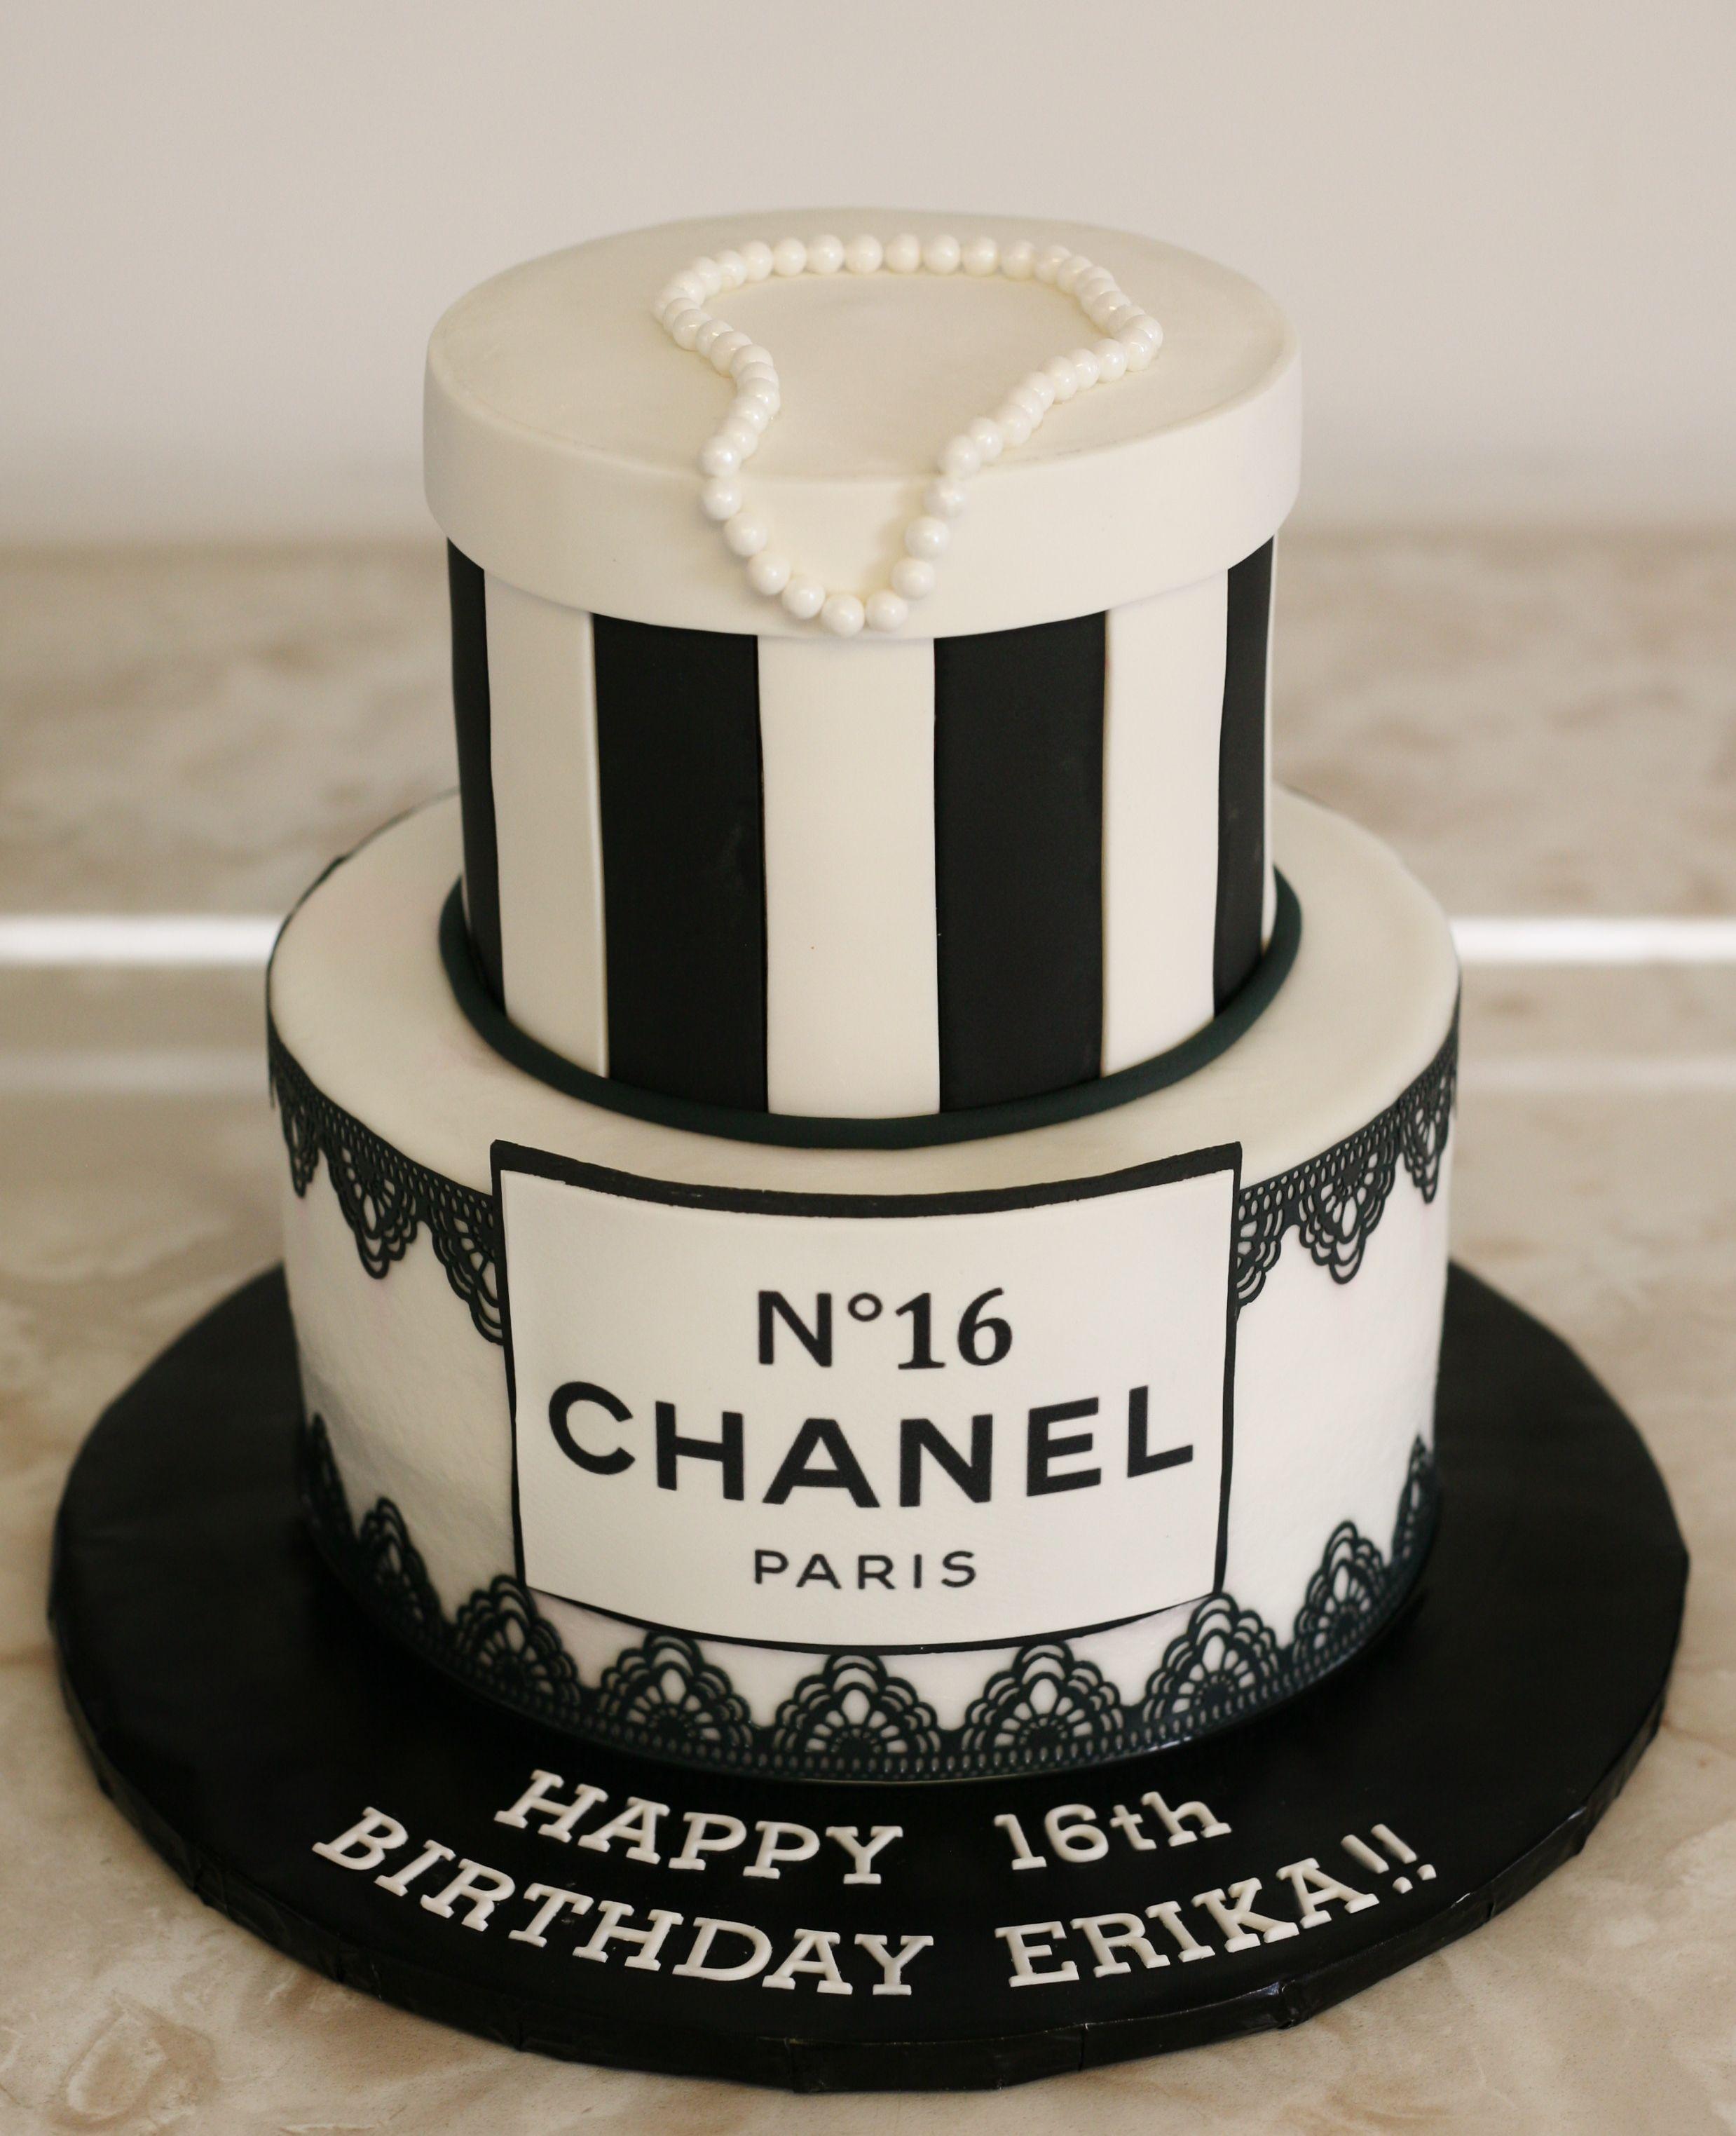 Chanel Cake Designs: Chanel Birthday Cake Www.kittiskakes.com